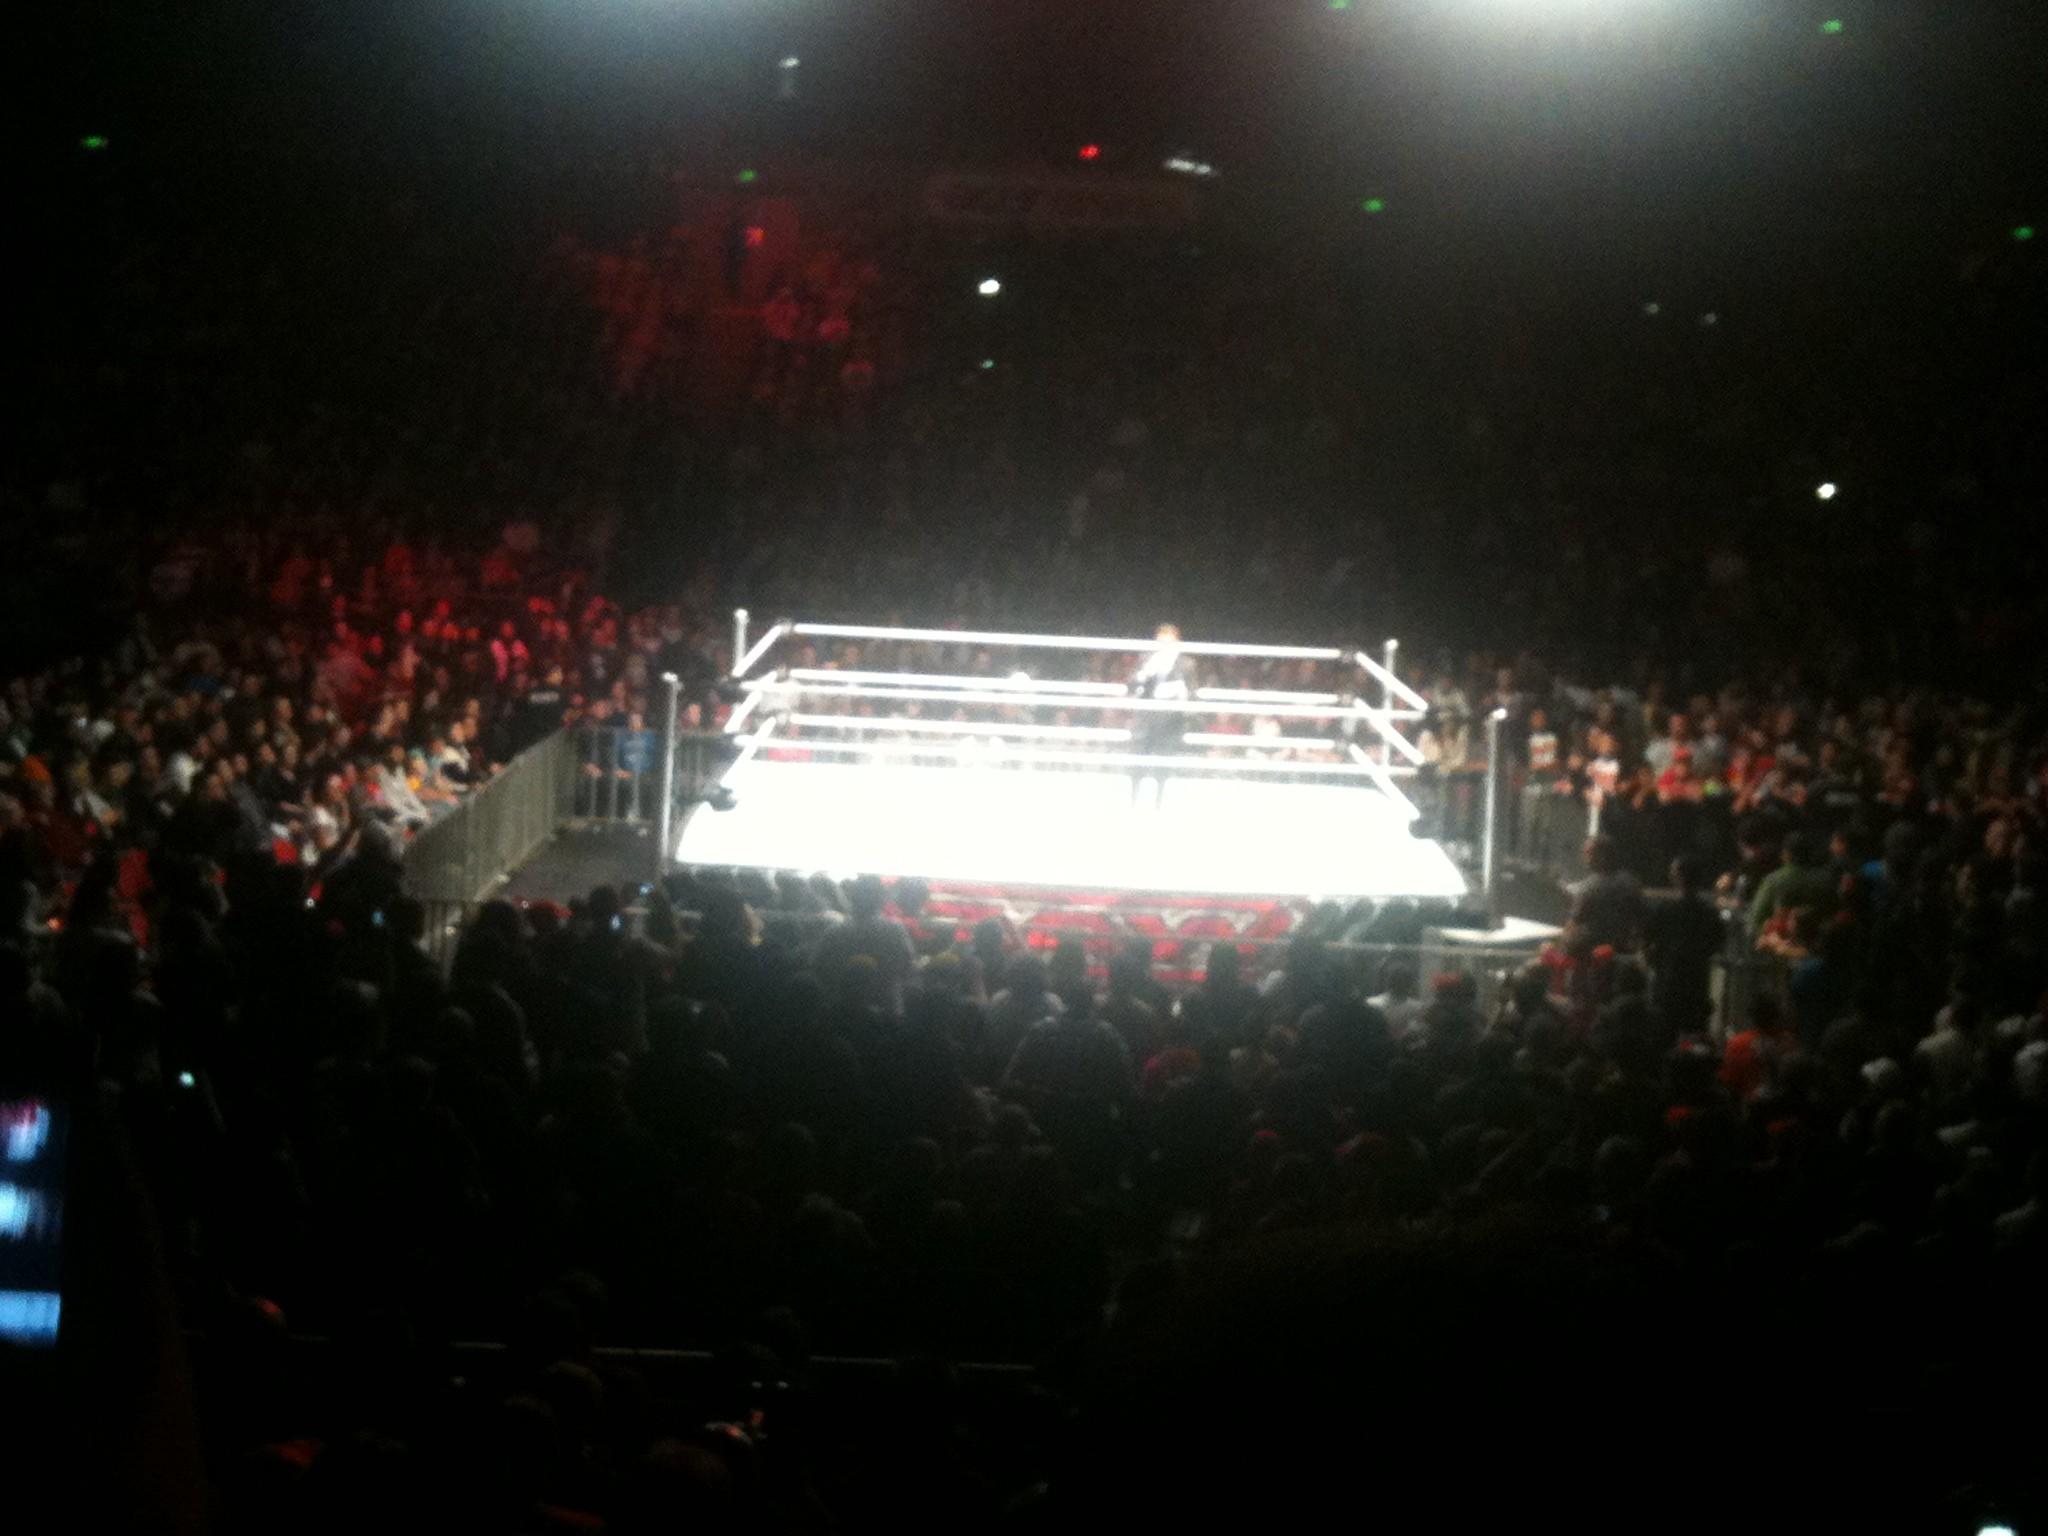 Res: 2048x1536, Cena, WWE, wrestling, Raw, smackdown, allphones, olympic park, australian